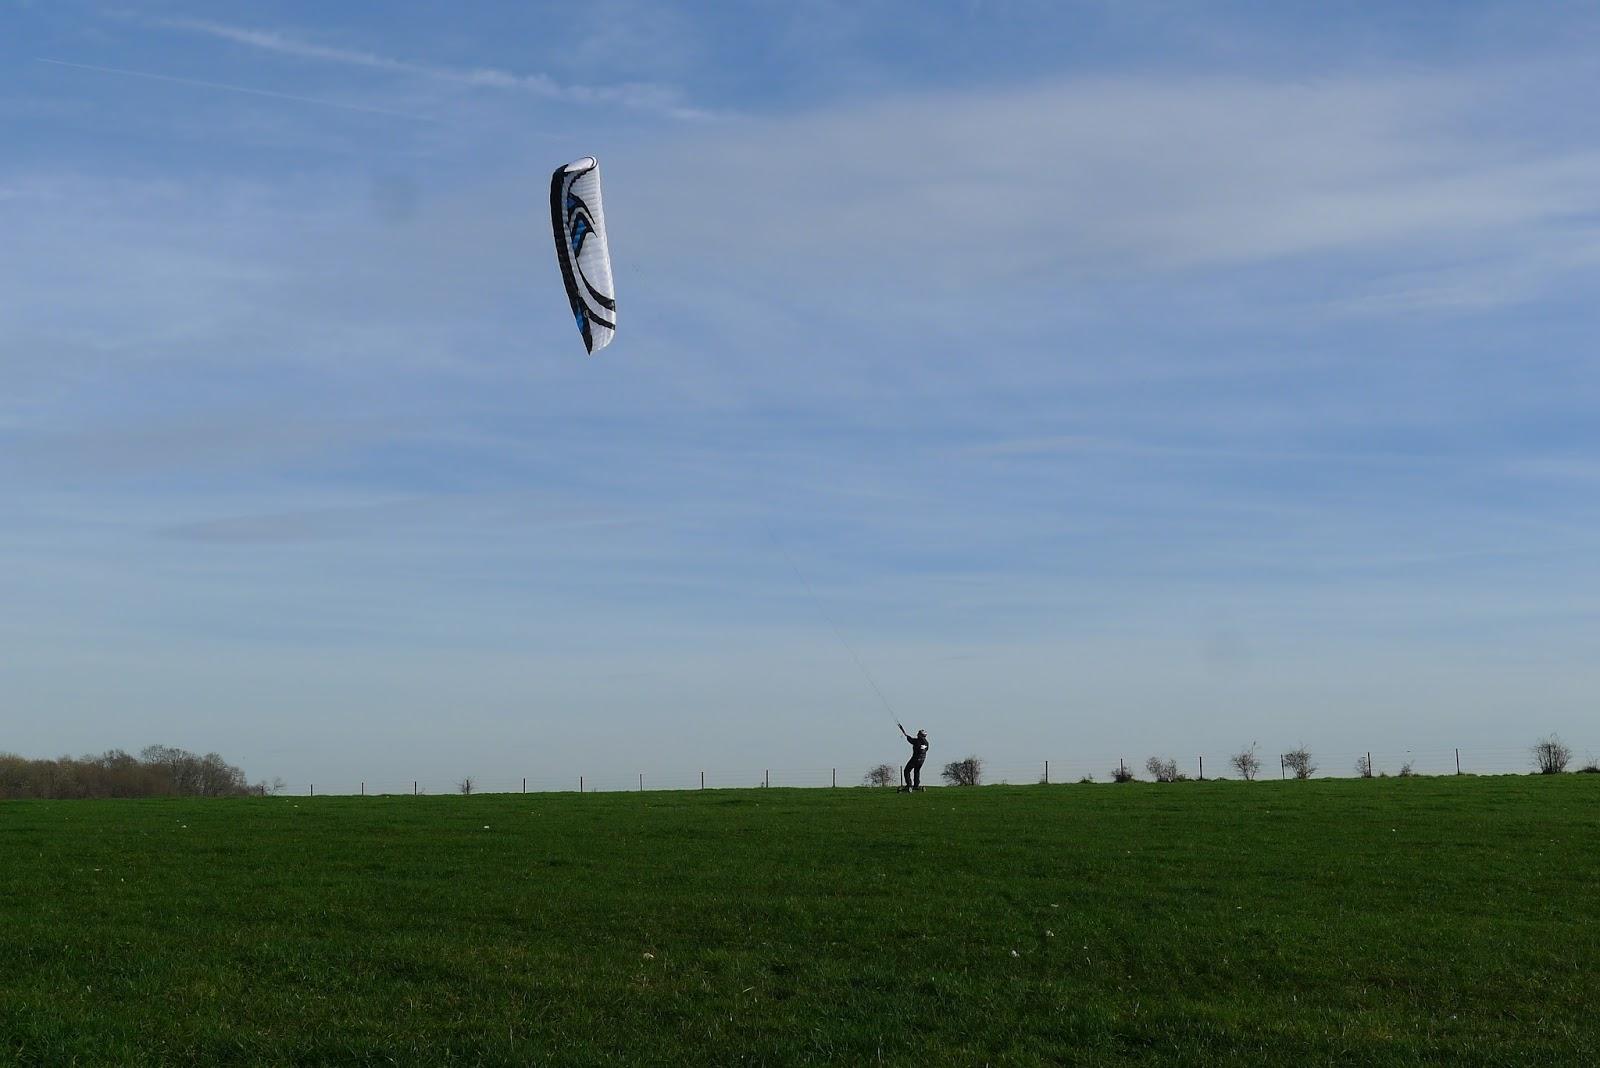 VENDUE ! Flysurfer Speed IV Lotus 18m complète 1390 € quasi neuve  P1260088